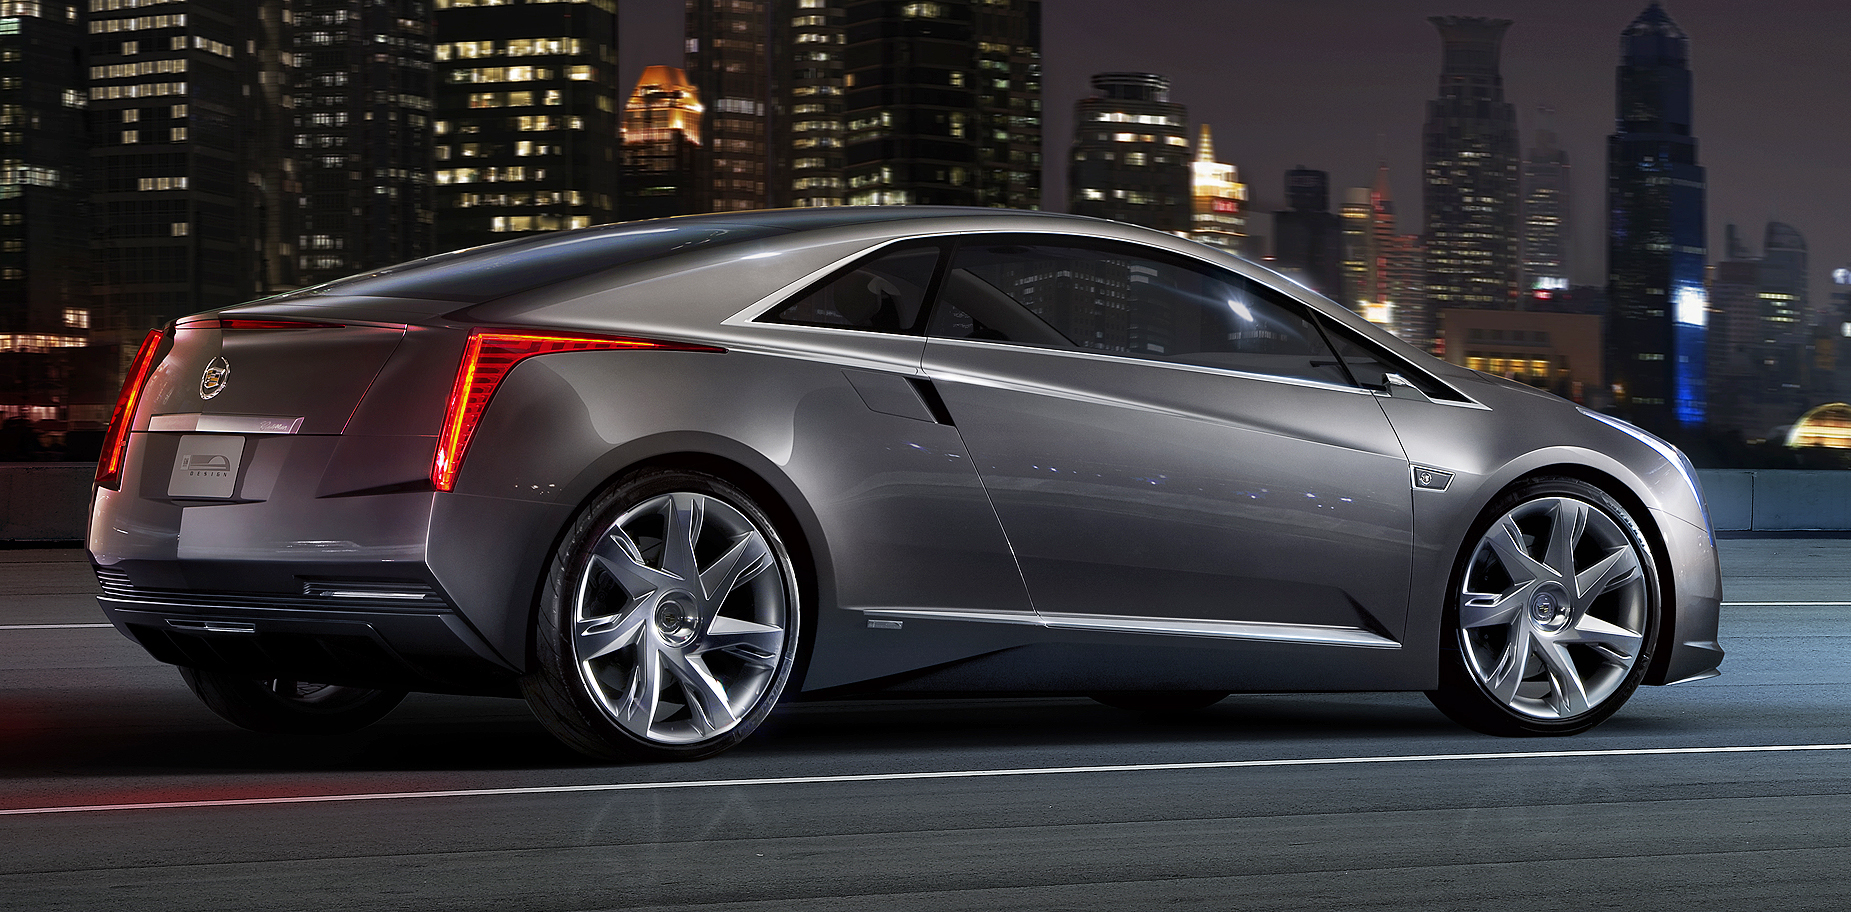 2021 Cadillac ELR Spy Shoot